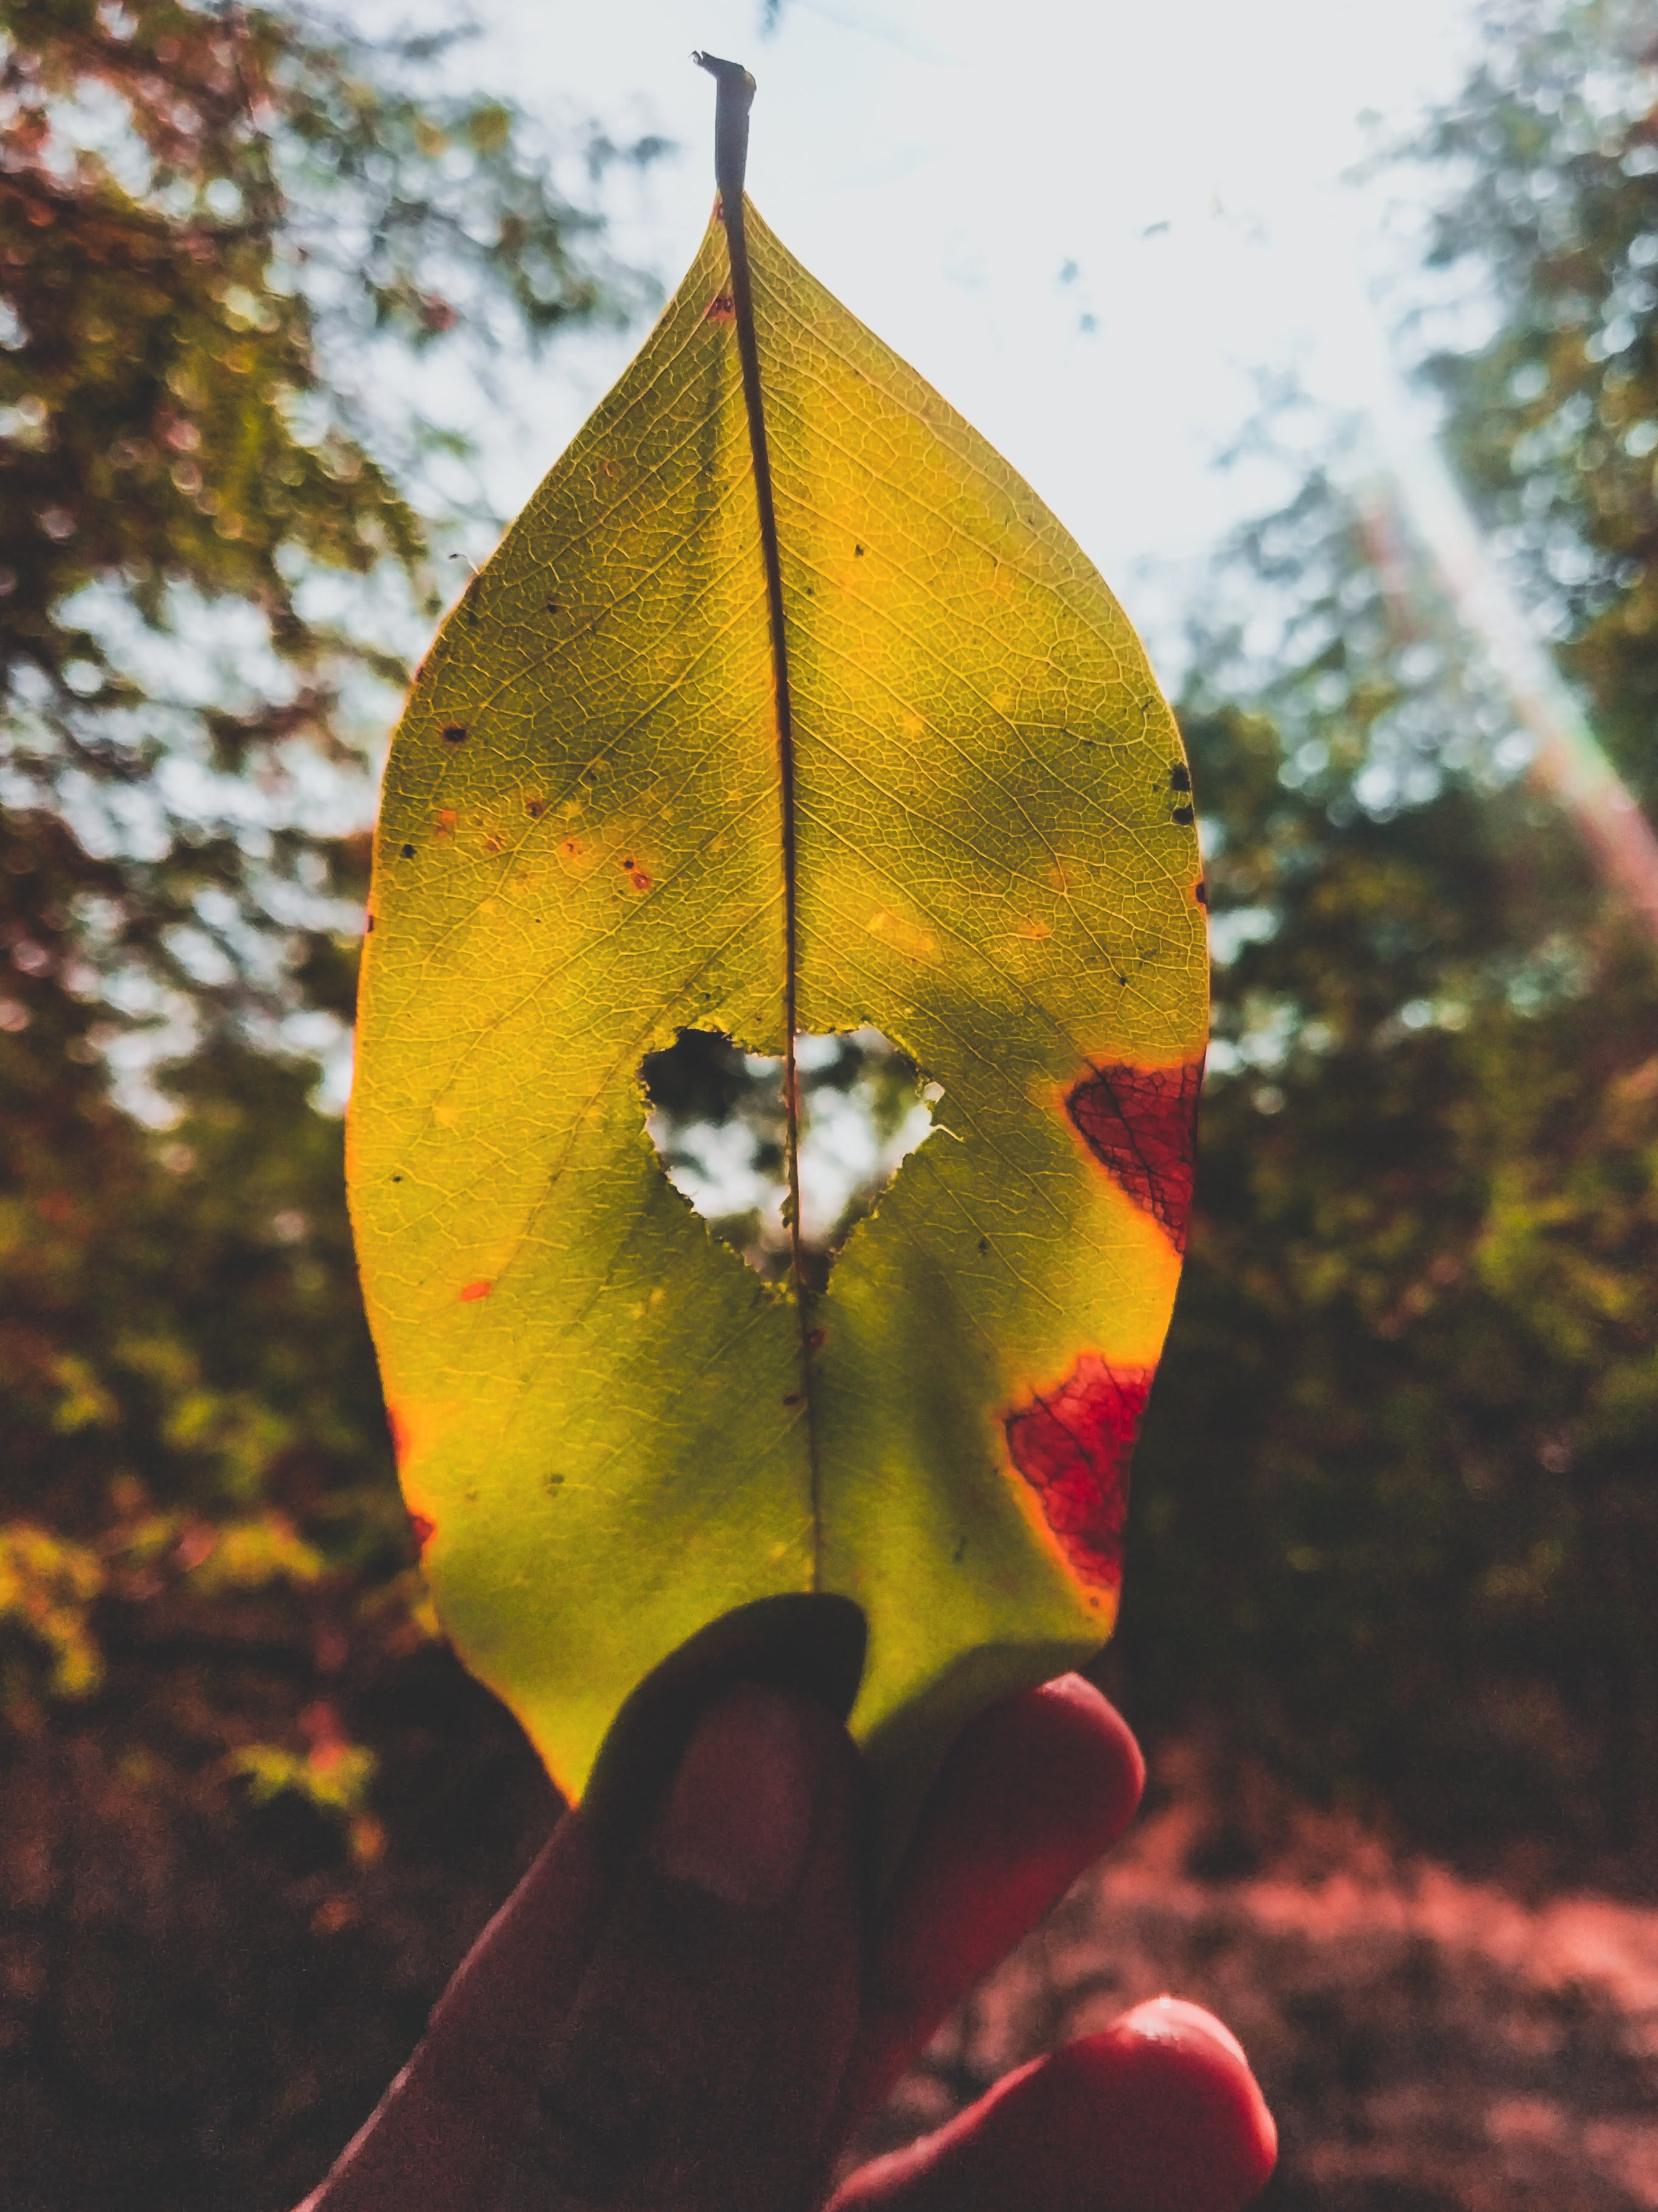 Free stock photo of Big leaf, blurred background, close up, creative